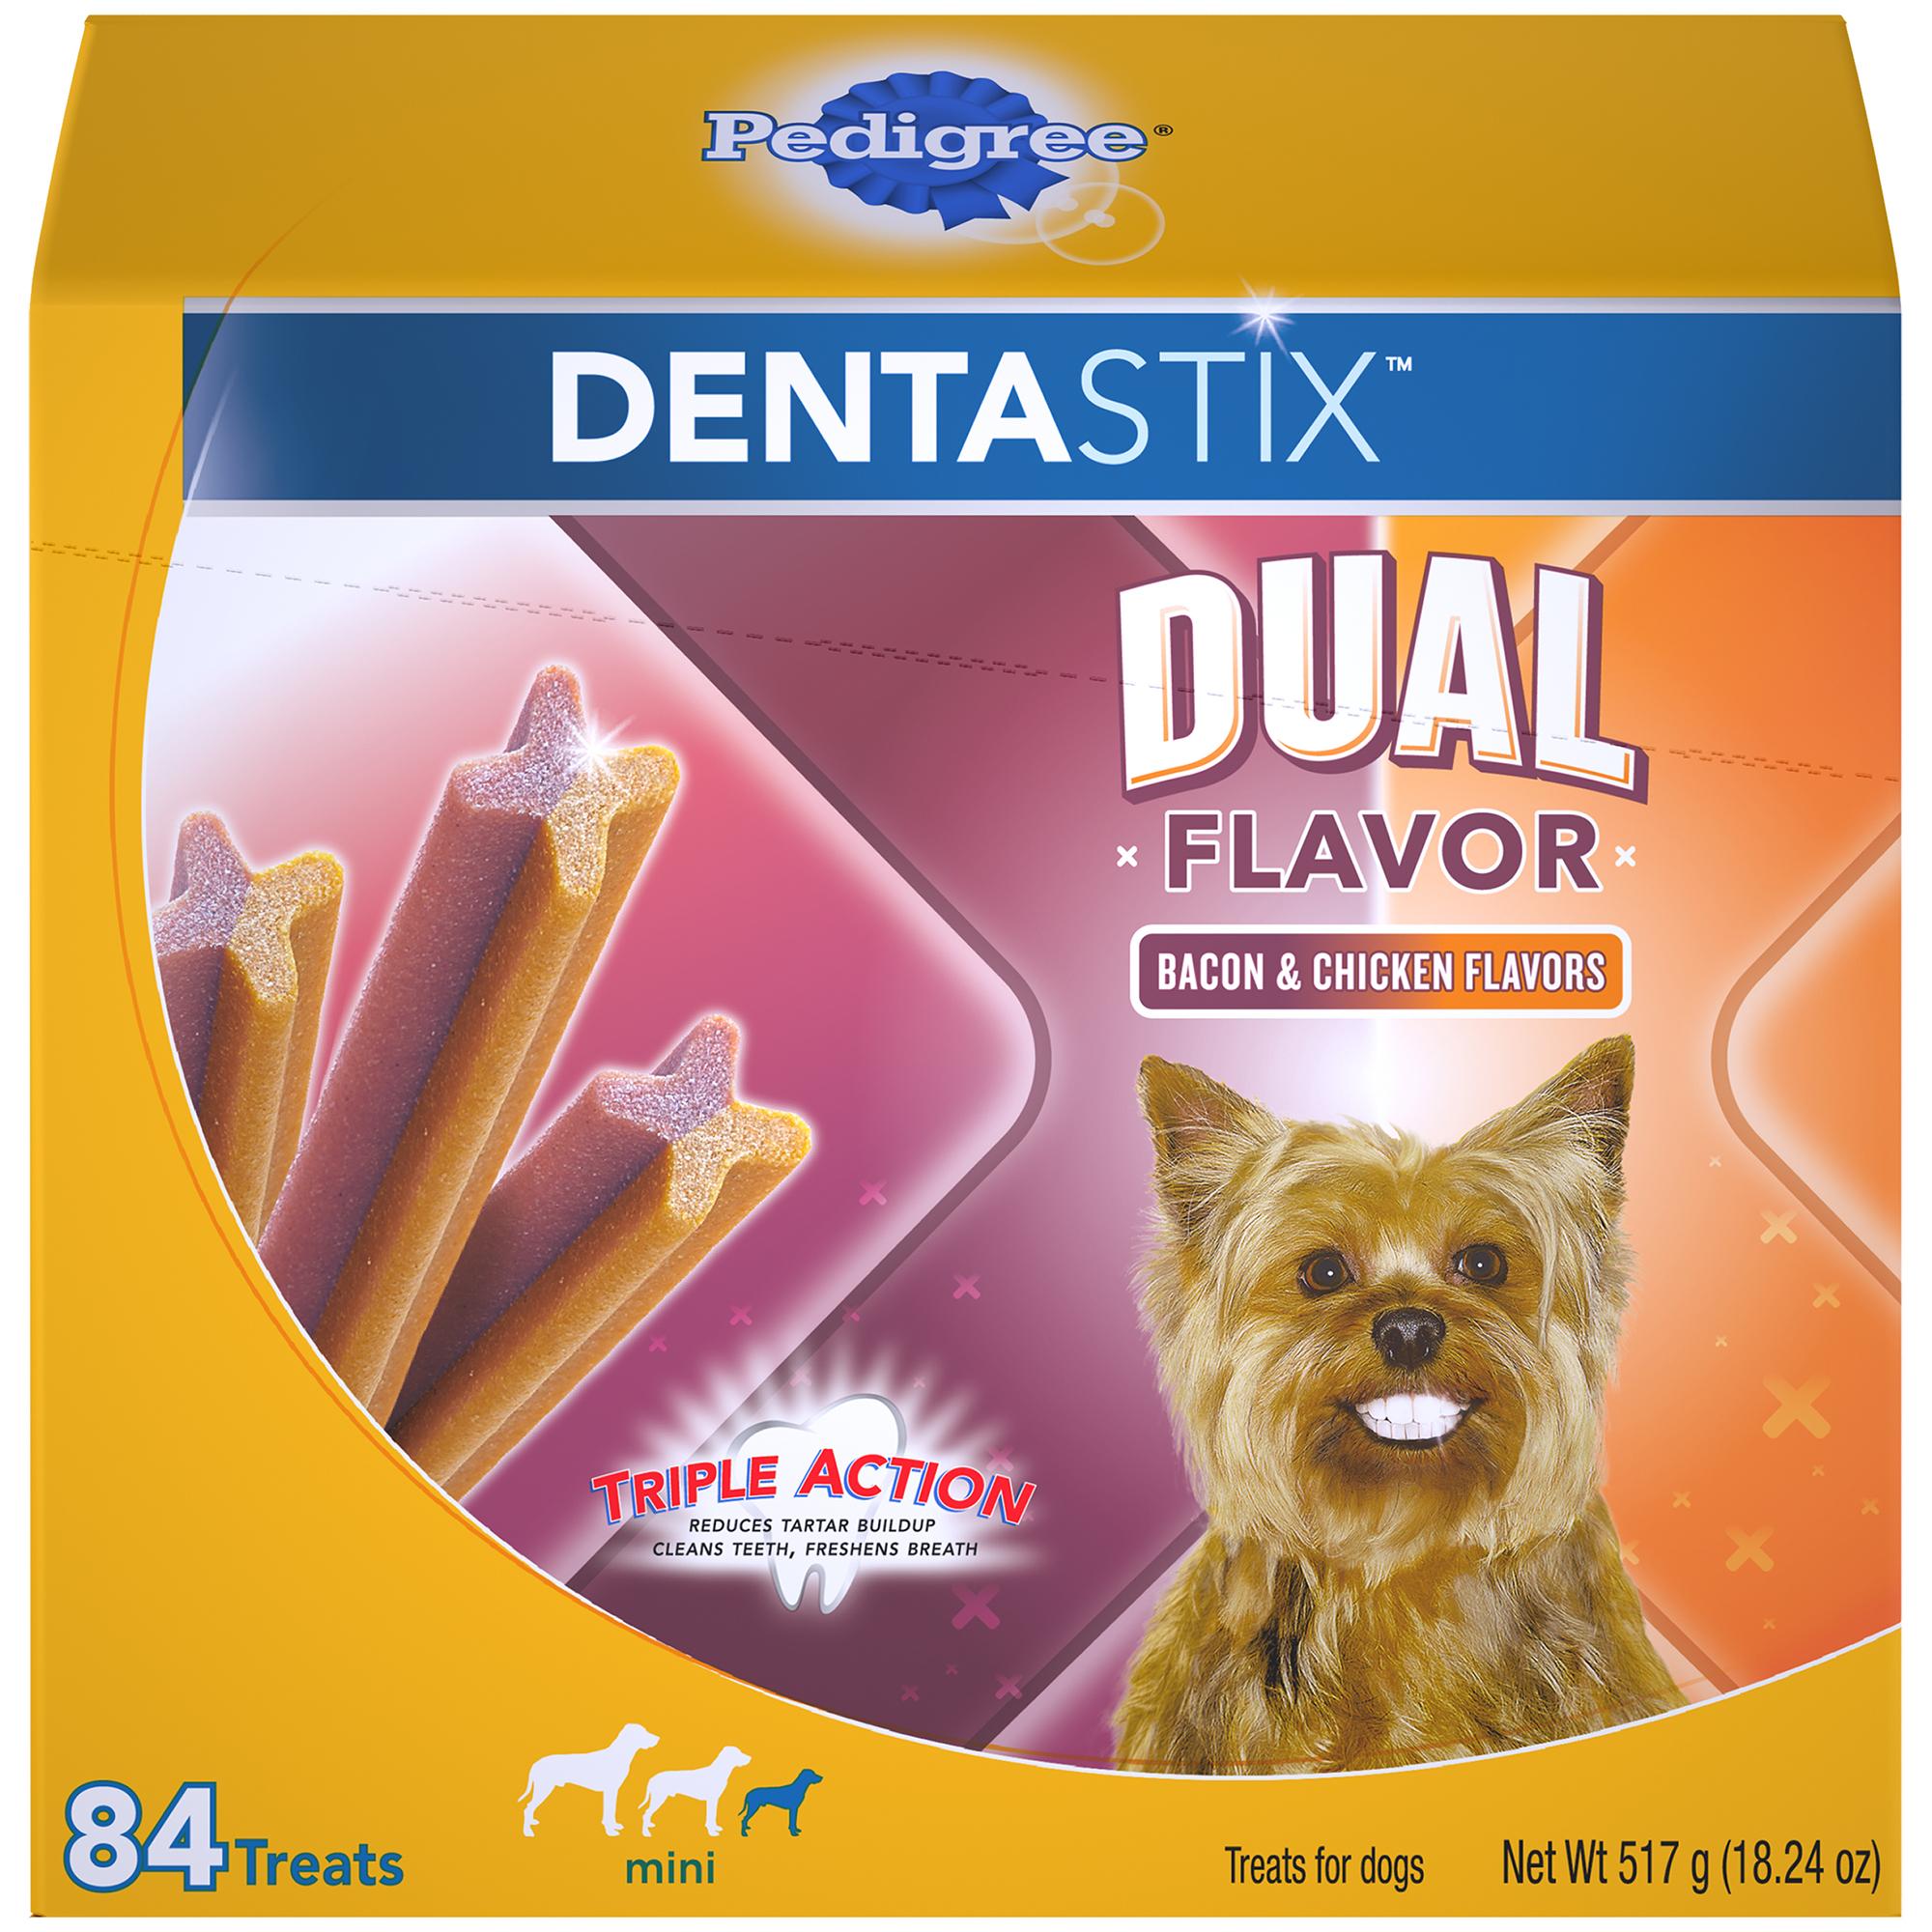 Pedigree Dentastix Dual Flavor Small Dog Treats, Bacon & Chicken Flavors, 18.24 oz. Pack (84 Treats)